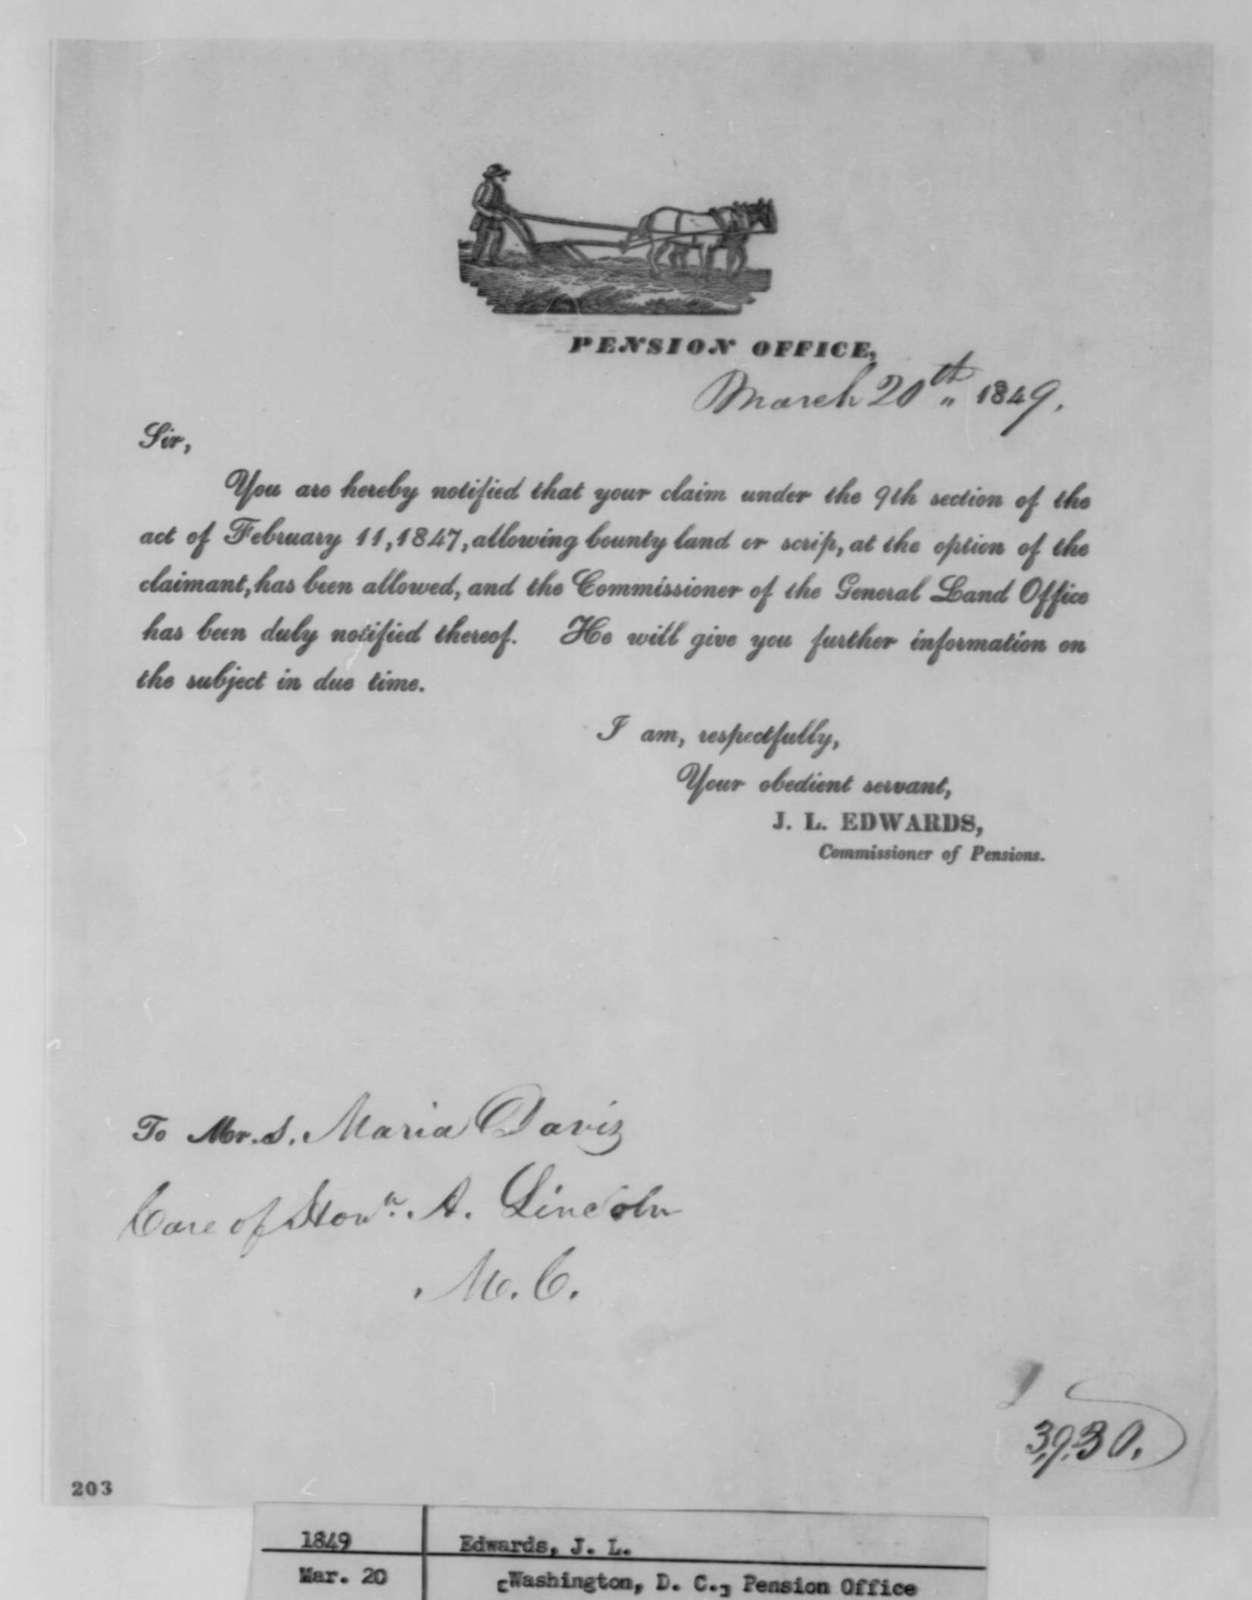 James L. Edwards to Maria Davis, Tuesday, March 20, 1849  (Bounty Land Claim)